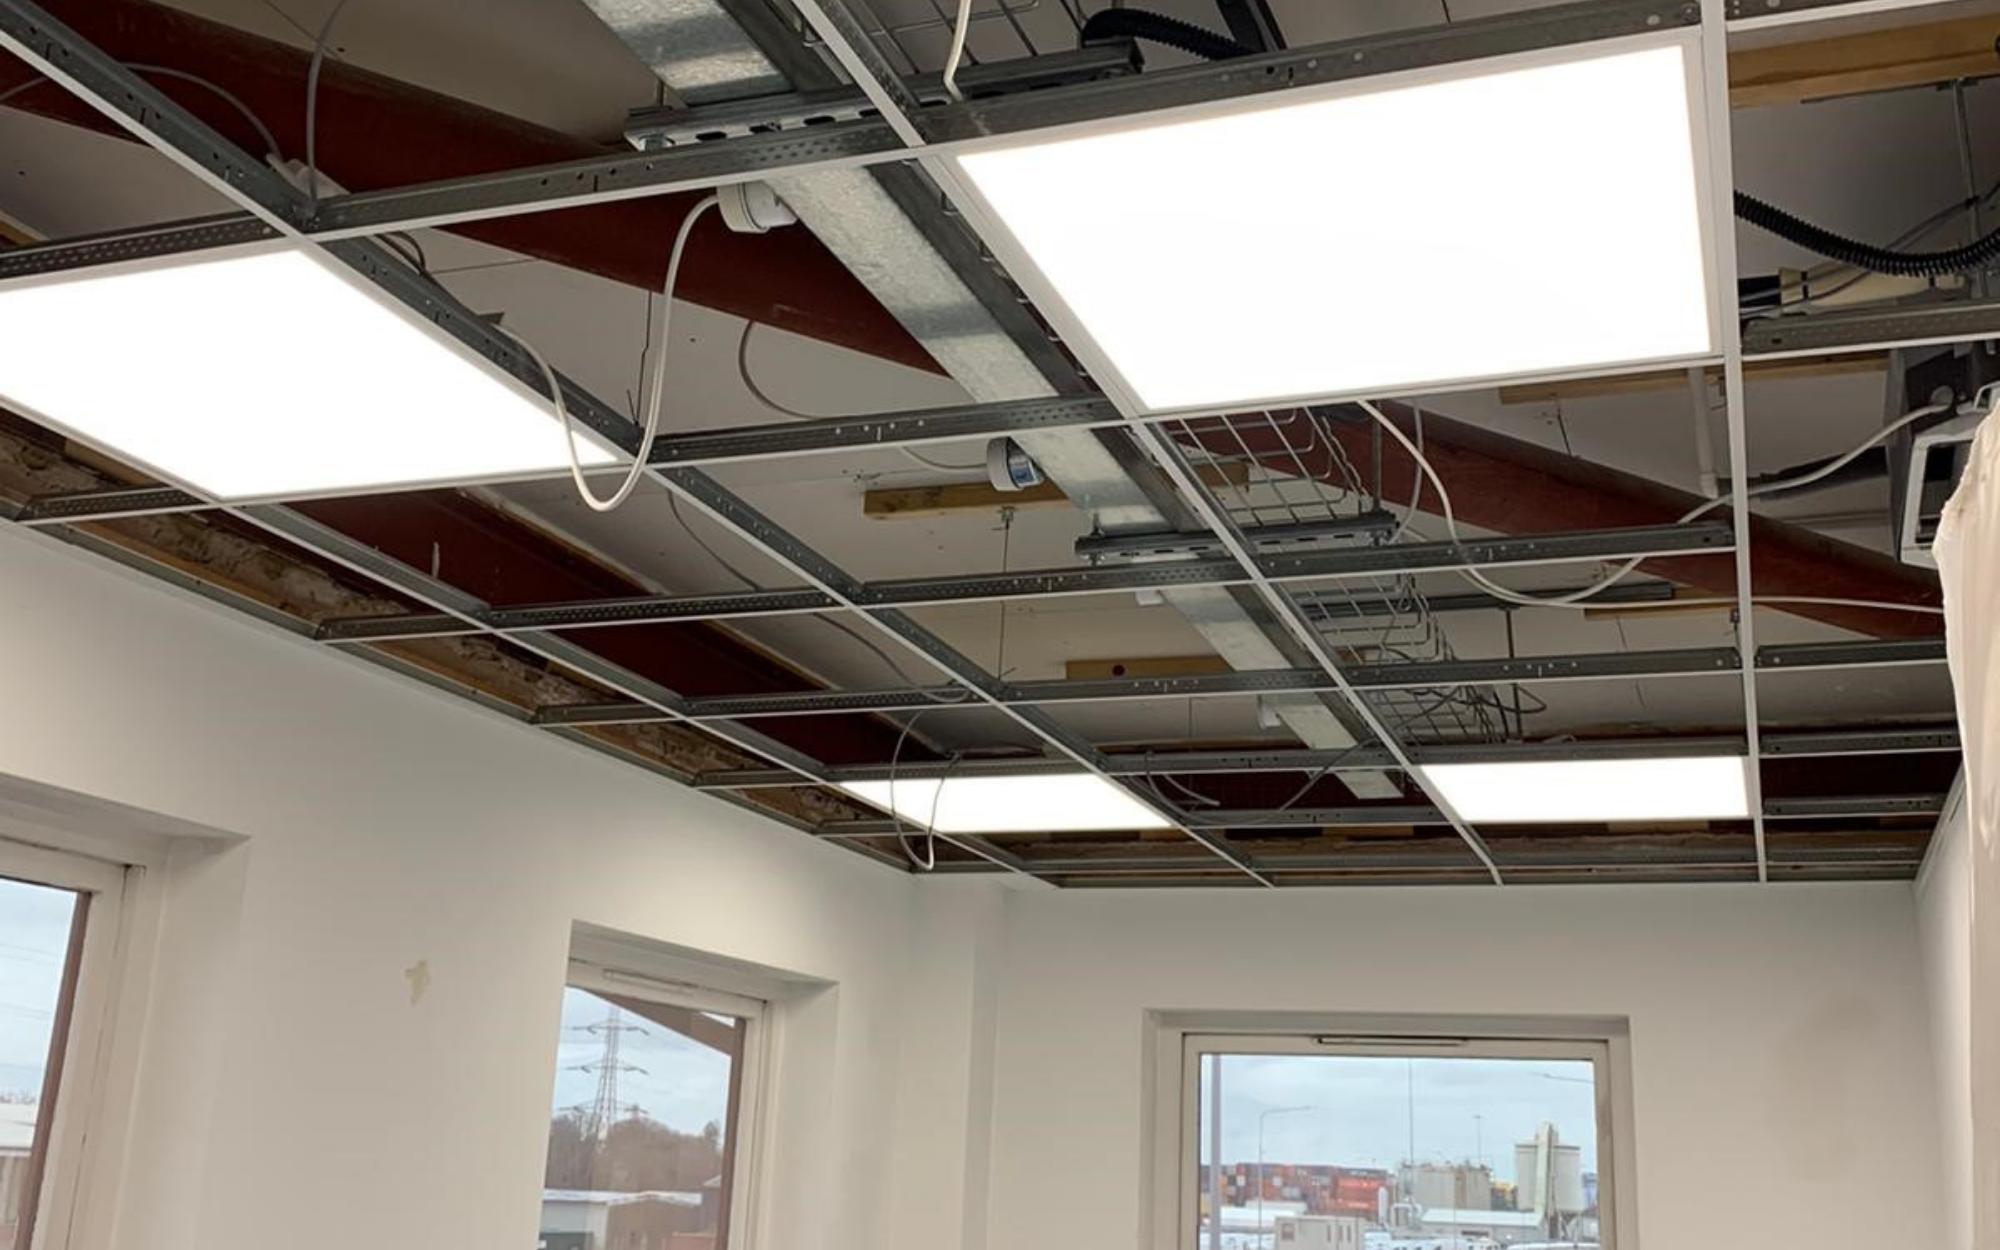 New LED ceiling lights